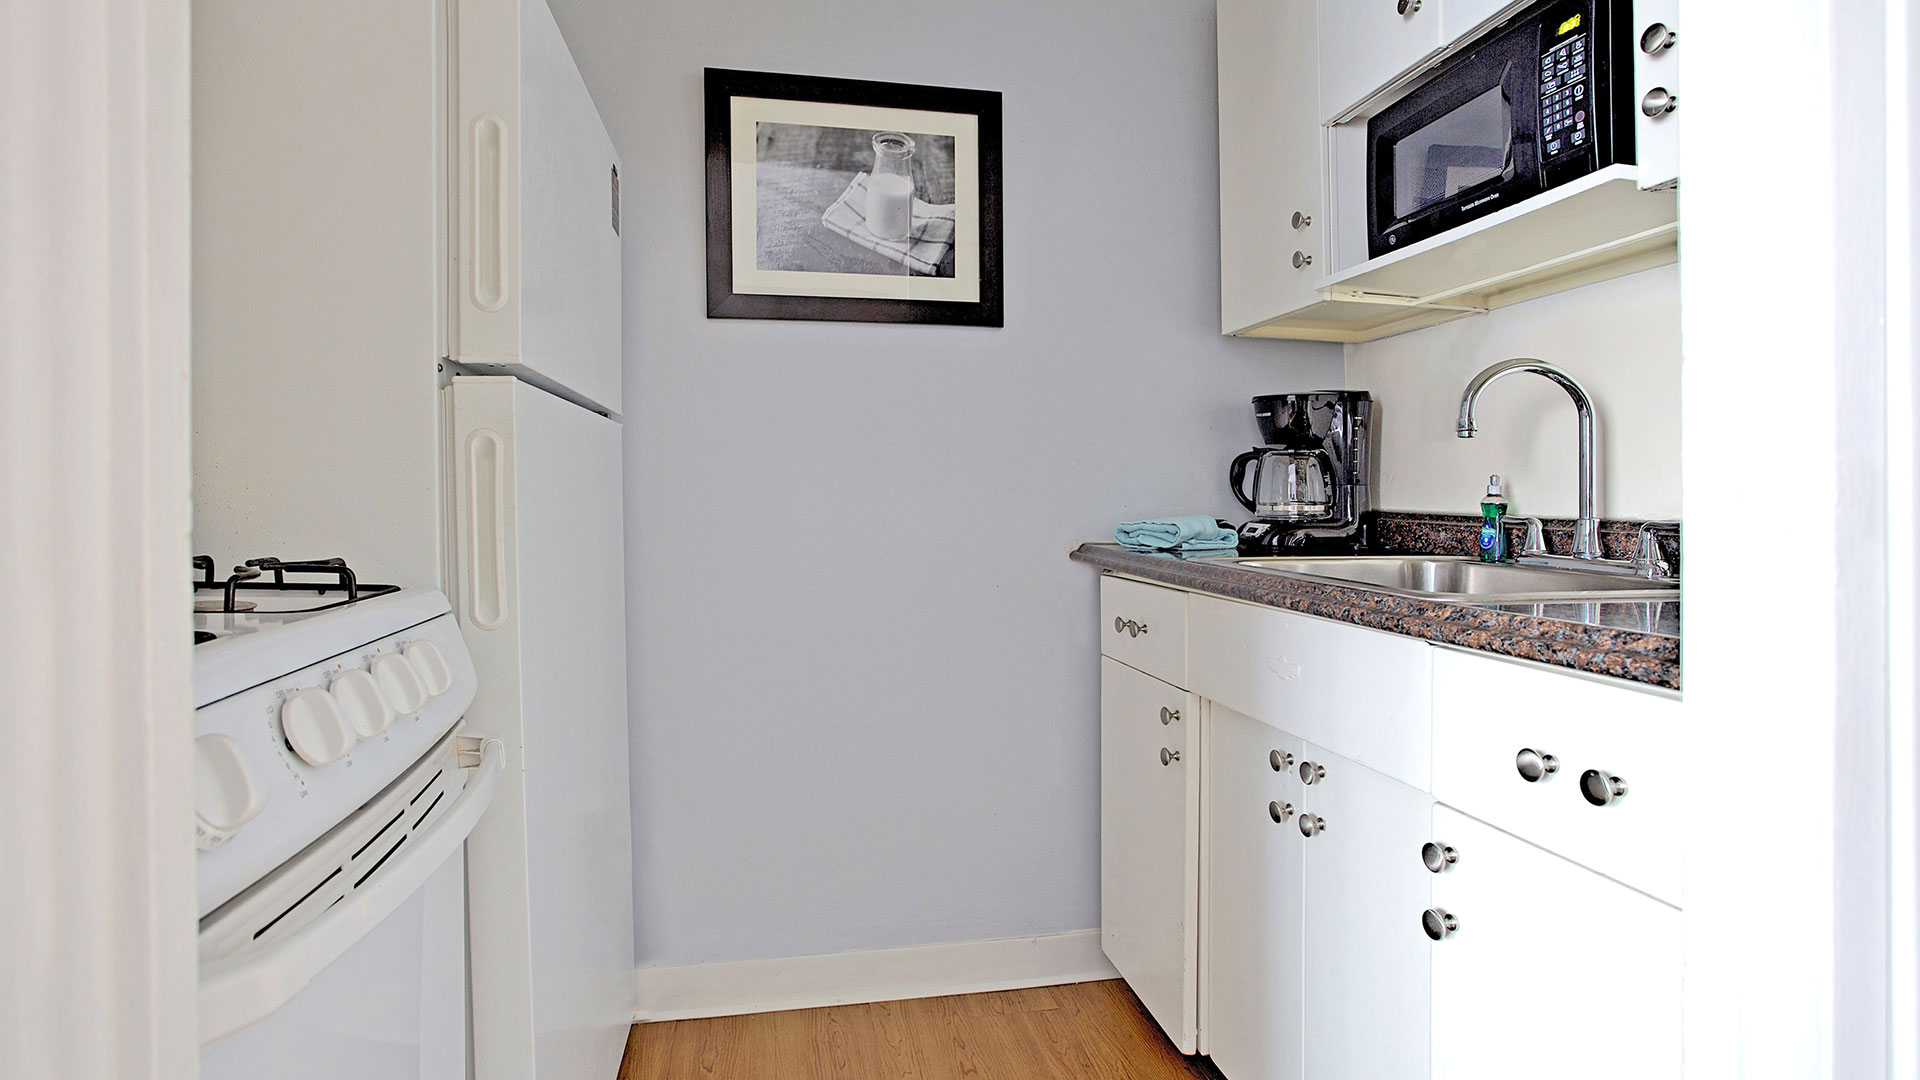 Kitchen at Shadyside Apartment